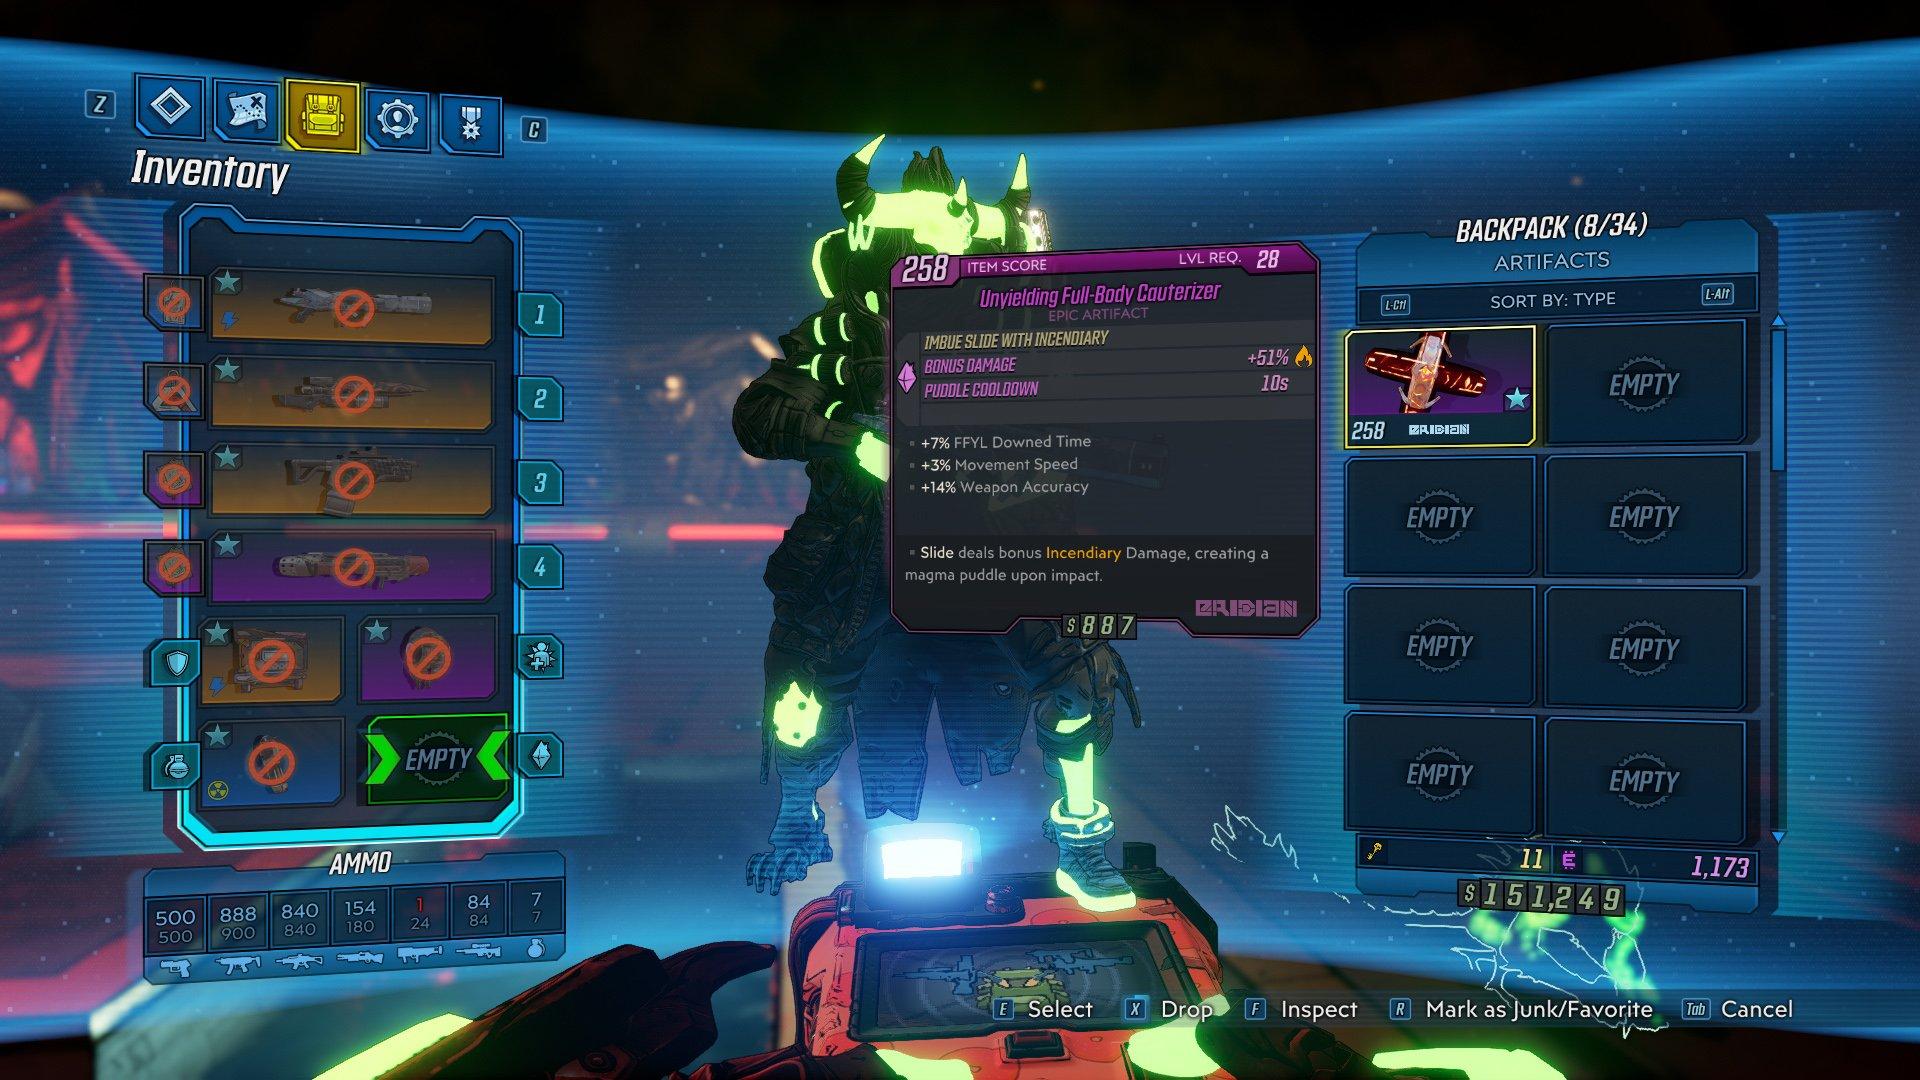 Borderlands 3 unlock artifact slot